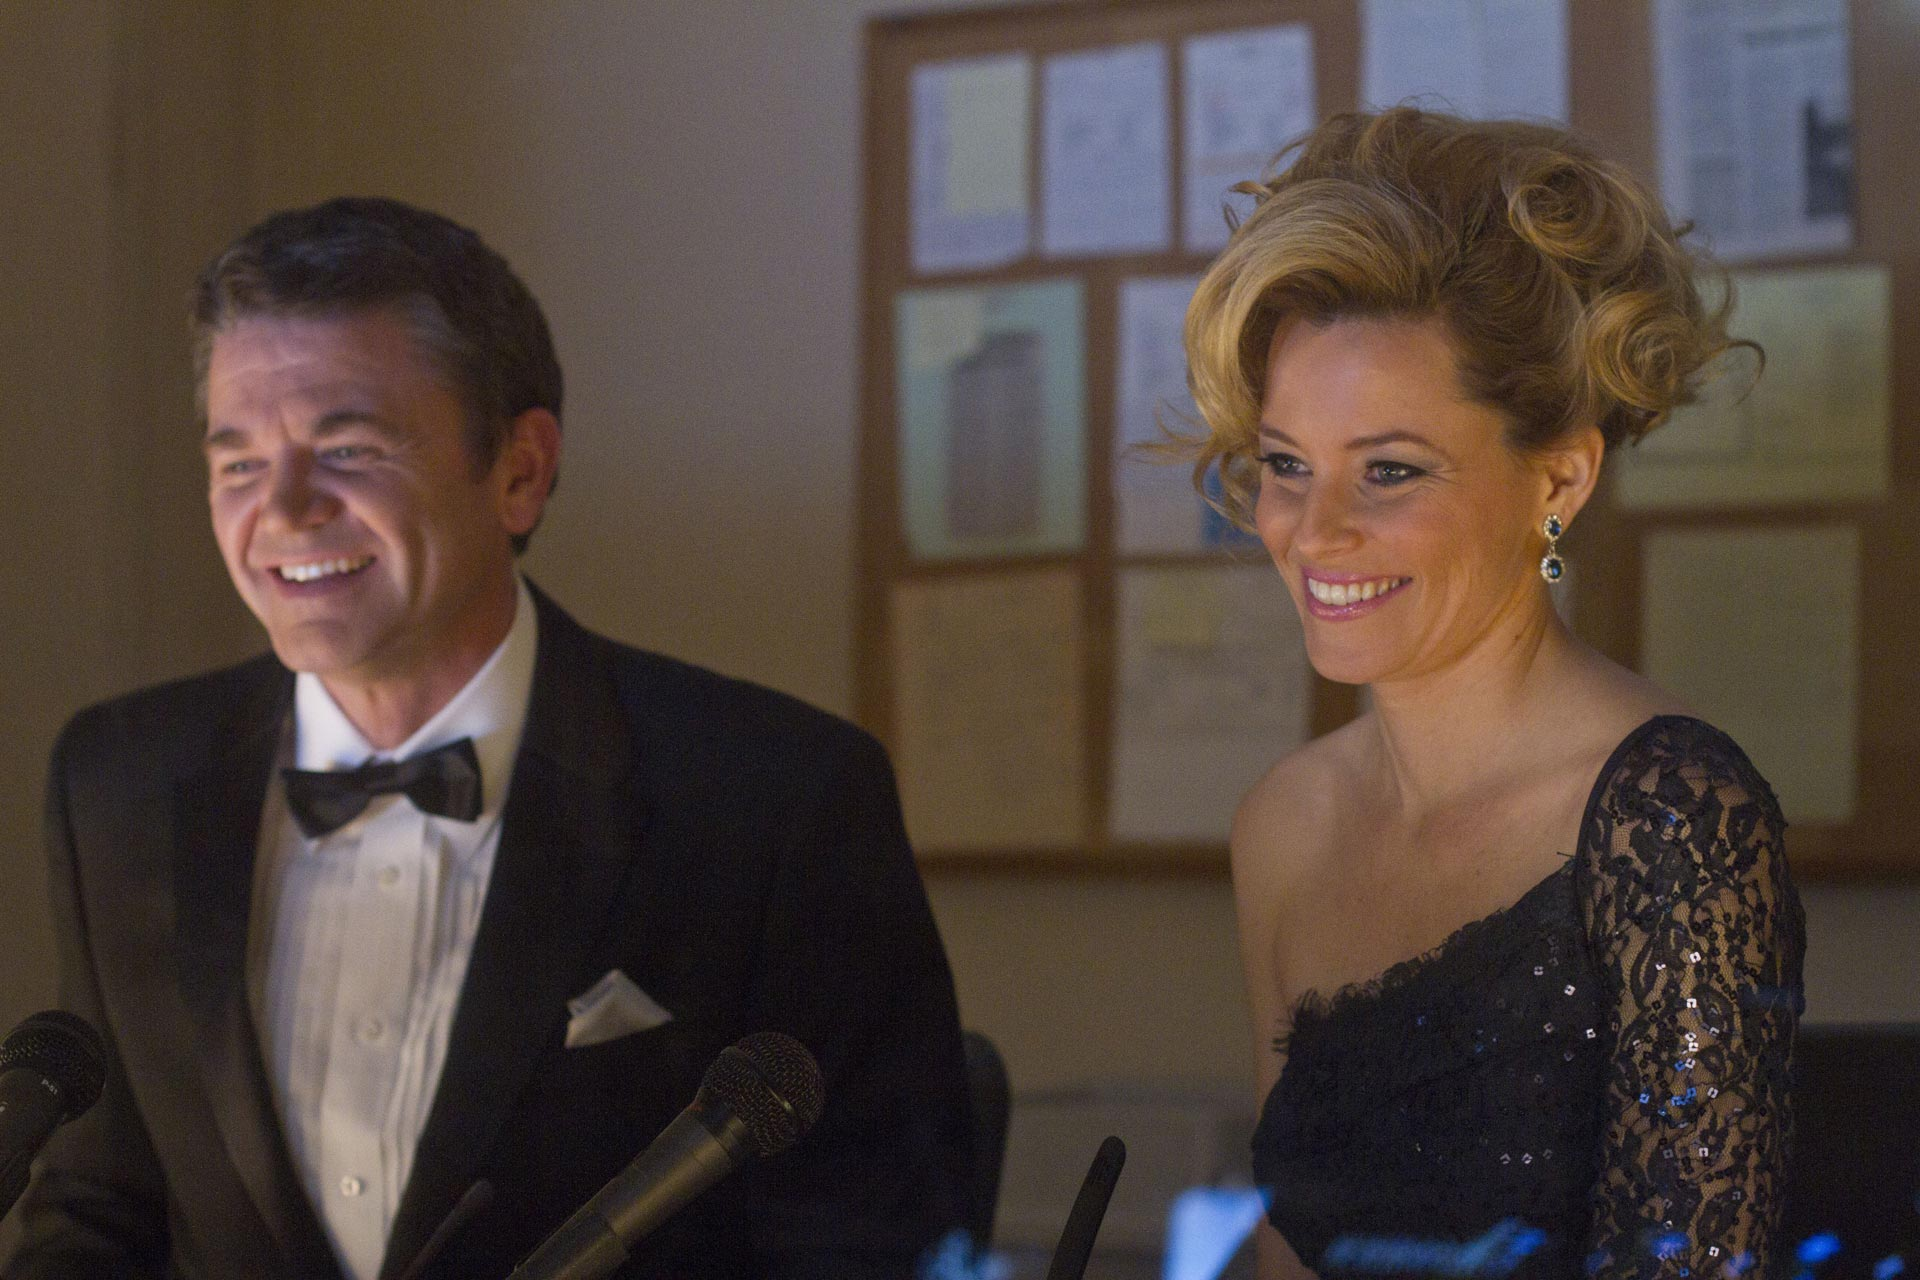 https://i1.wp.com/www.filmofilia.com/wp-content/uploads/2012/06/Pitch-Perfect-img-03.jpg